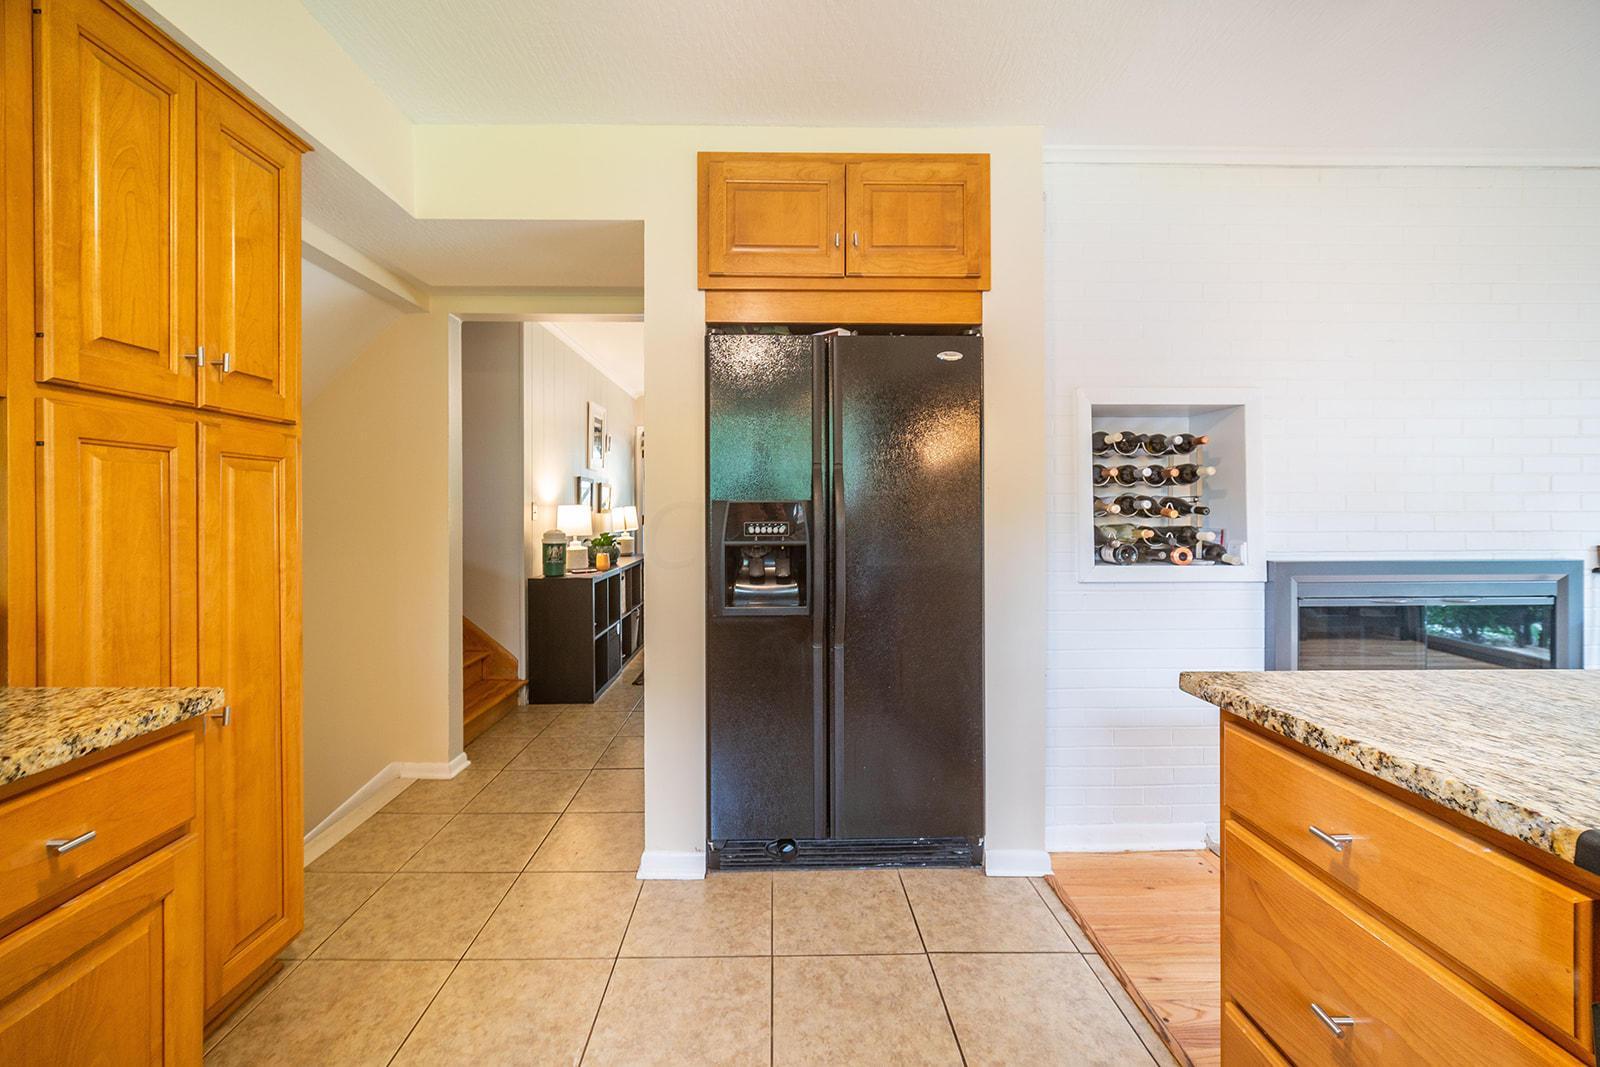 3675 Ridgewood Drive, Hilliard, Ohio 43026, 4 Bedrooms Bedrooms, ,3 BathroomsBathrooms,Residential,For Sale,Ridgewood,220020747